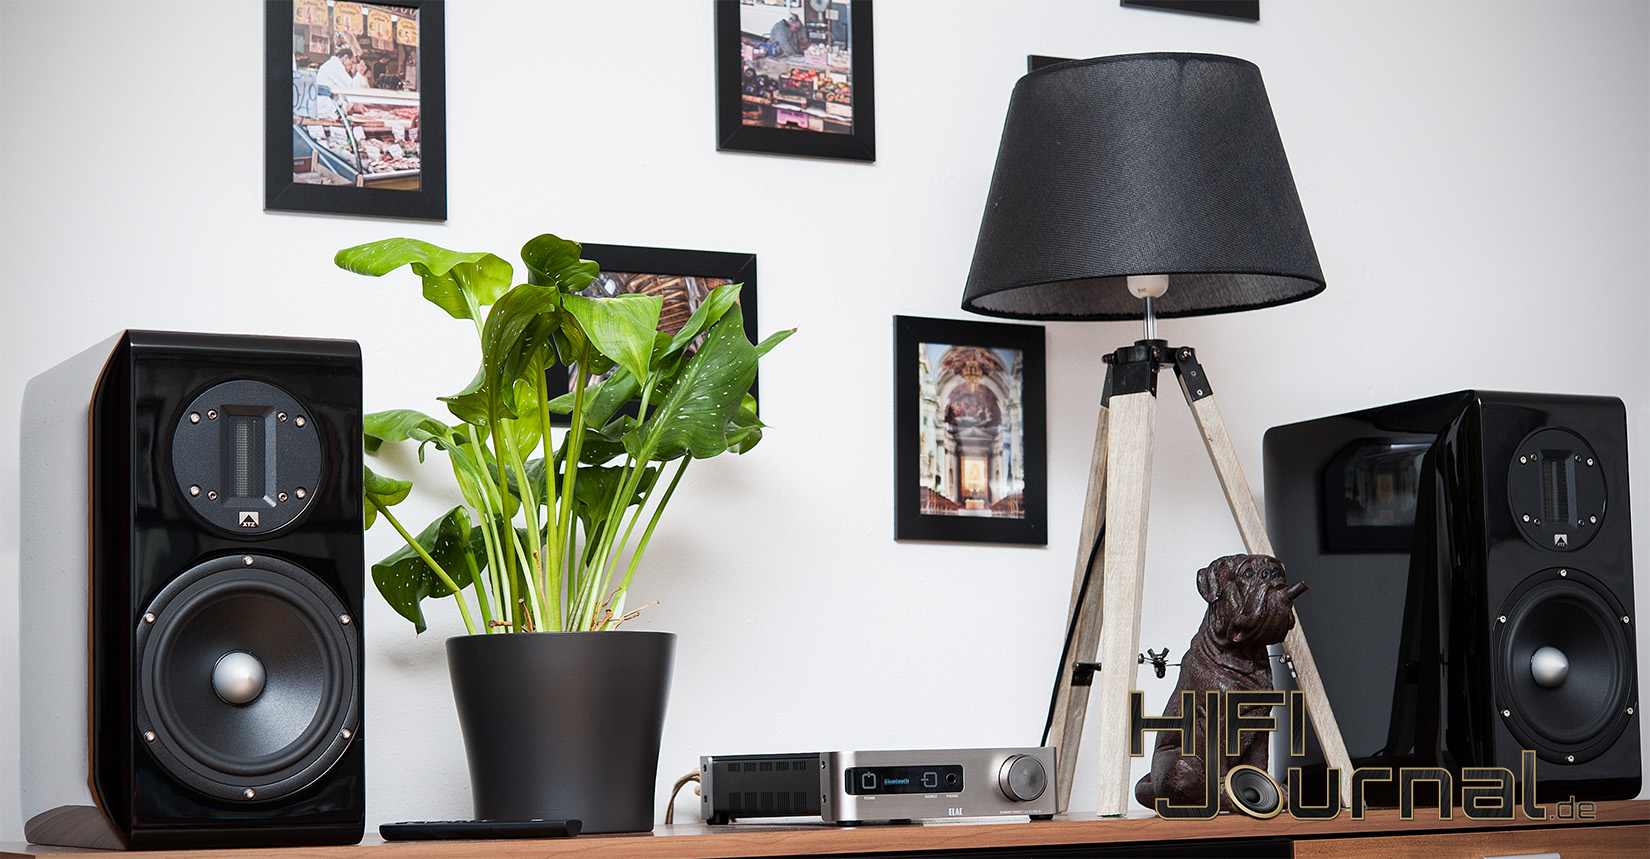 test xtz lautsprecher subwoofer hifi. Black Bedroom Furniture Sets. Home Design Ideas